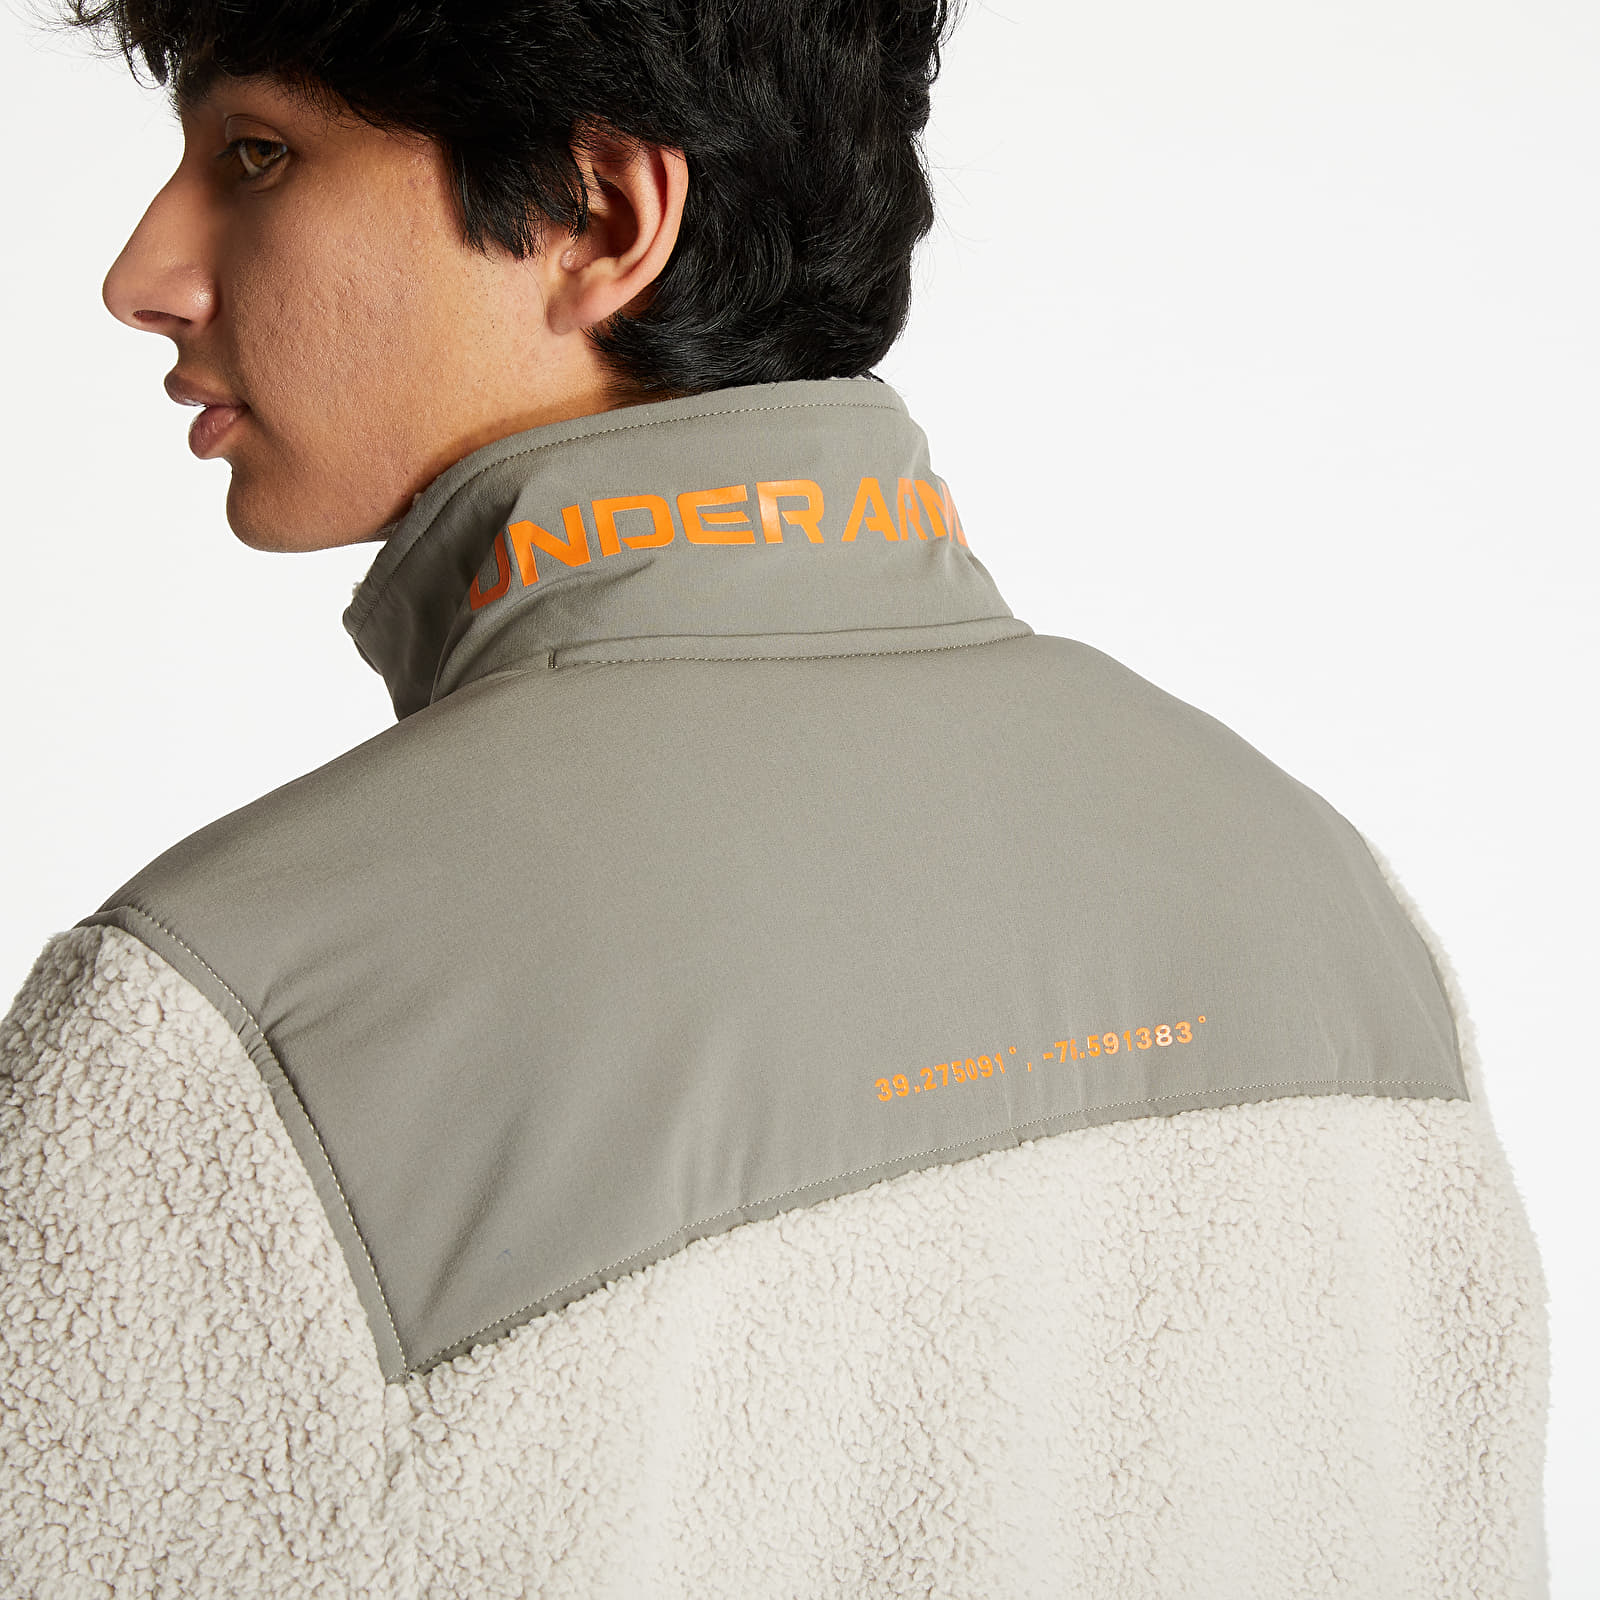 Jackets and Coats Under Armour Legacy Sherpa Swacket Highland Buff/ Brown Umber/ Vibe Orange